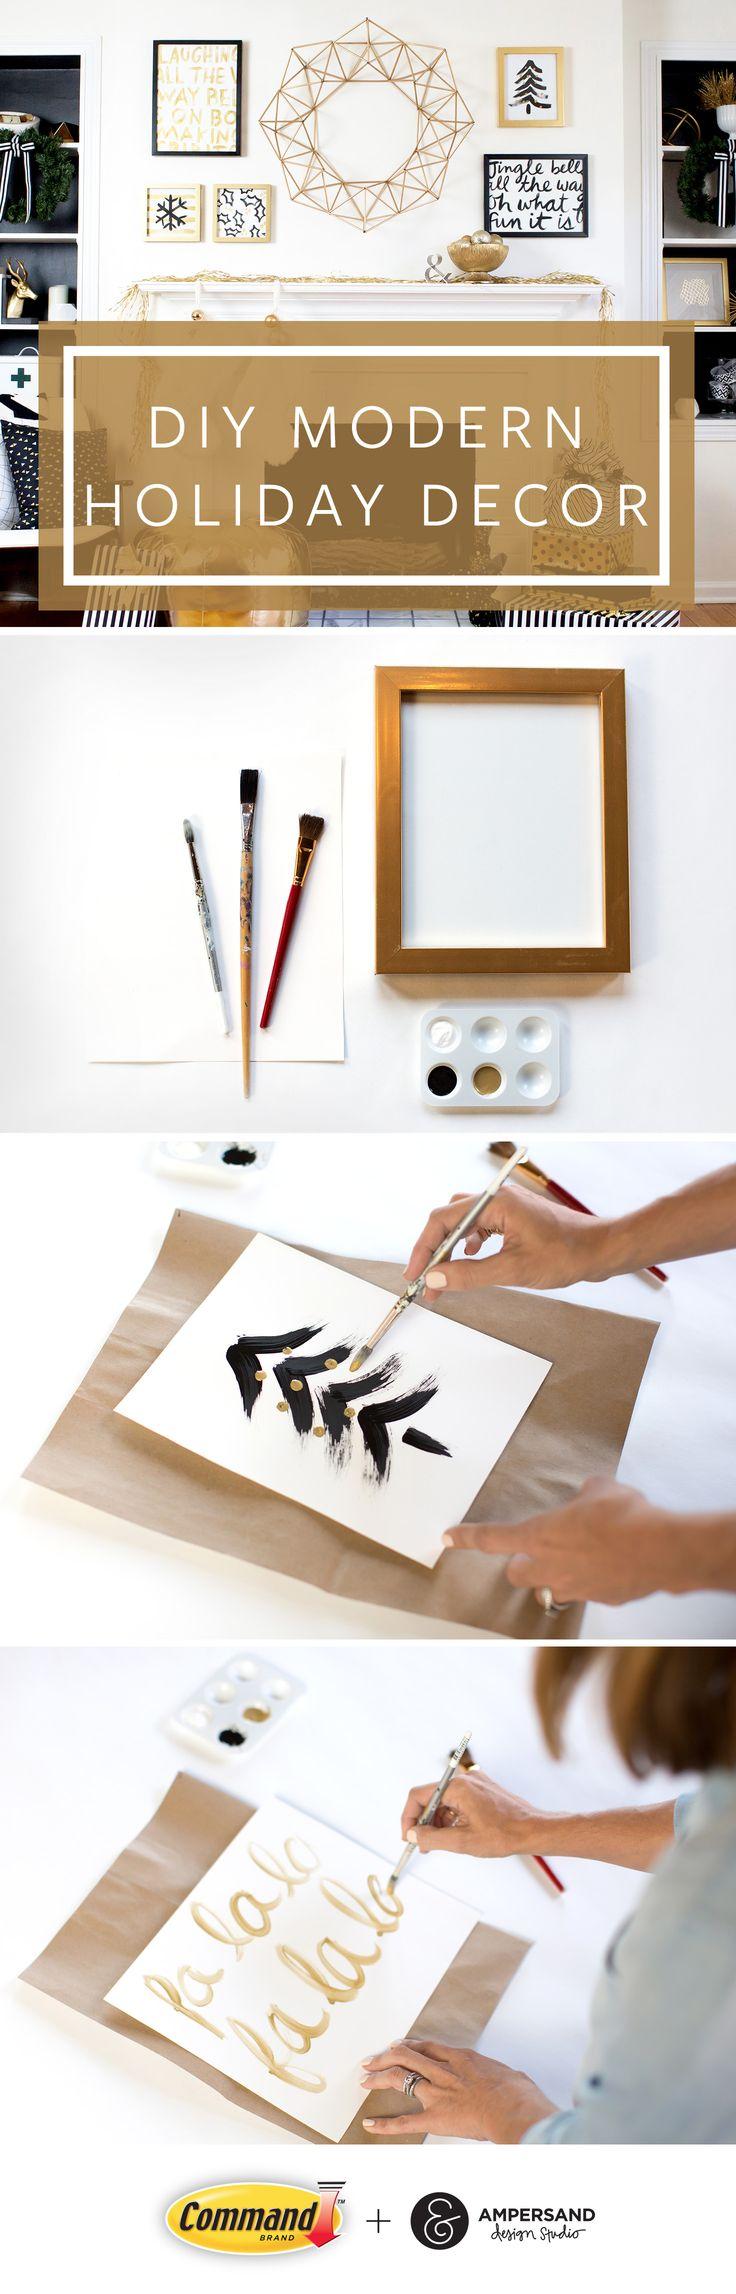 best crafts for home decor images on pinterest craft